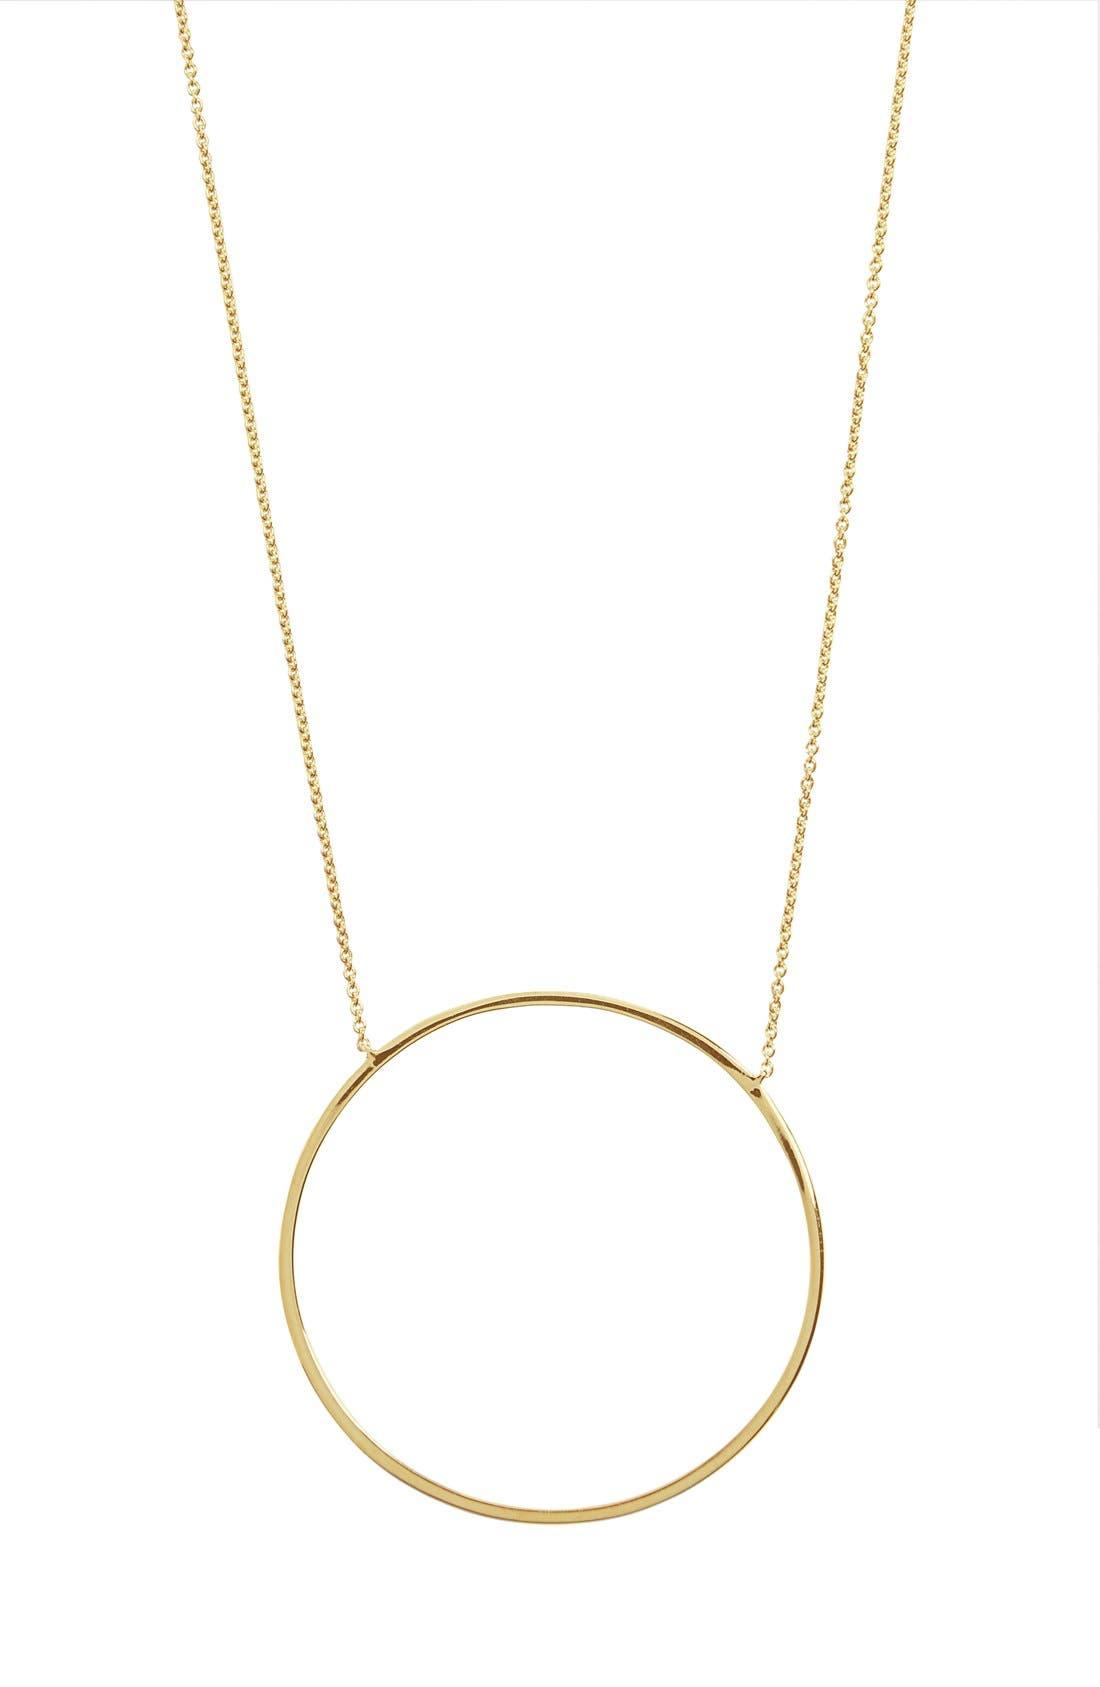 BONY LEVY Pendant Necklace